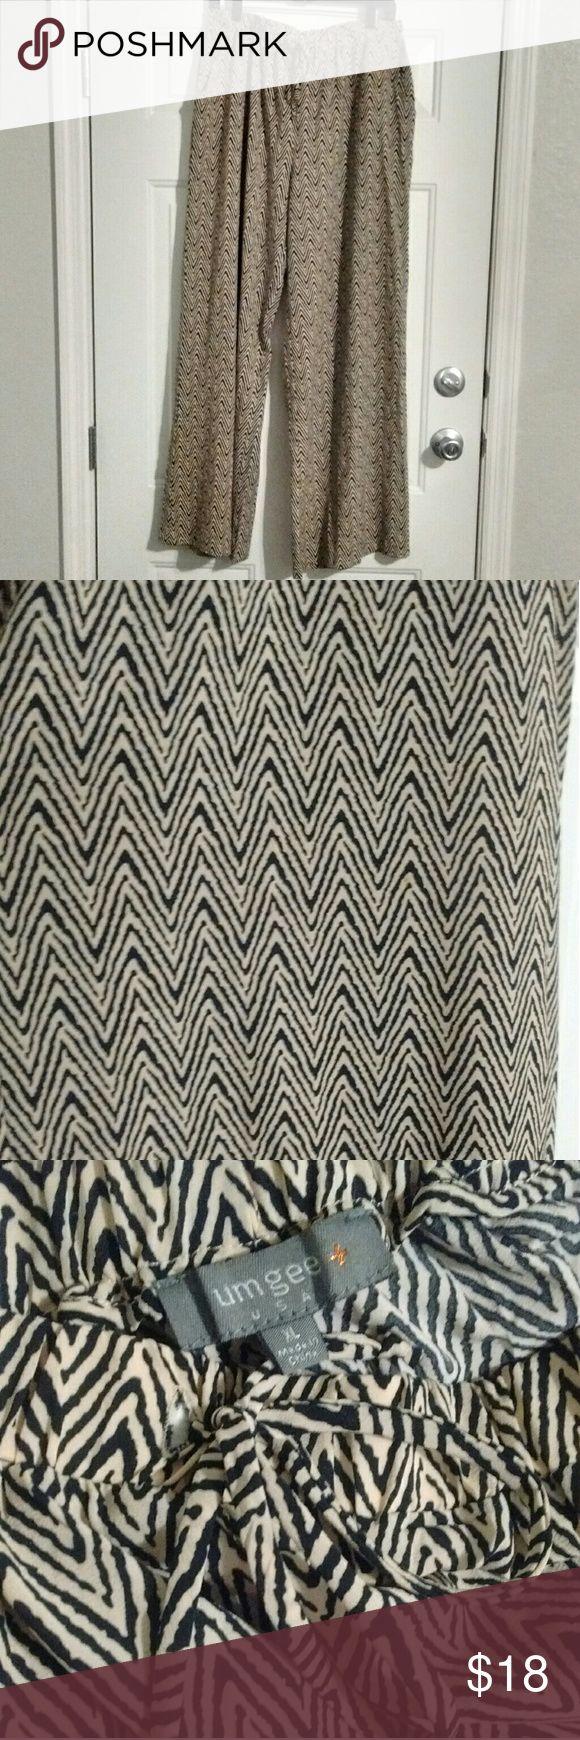 Umgee Chevron Pants Chevron pants with pockets, elastic waistband & waist tie.   Brand: Umgee Size: XL Umgee Pants